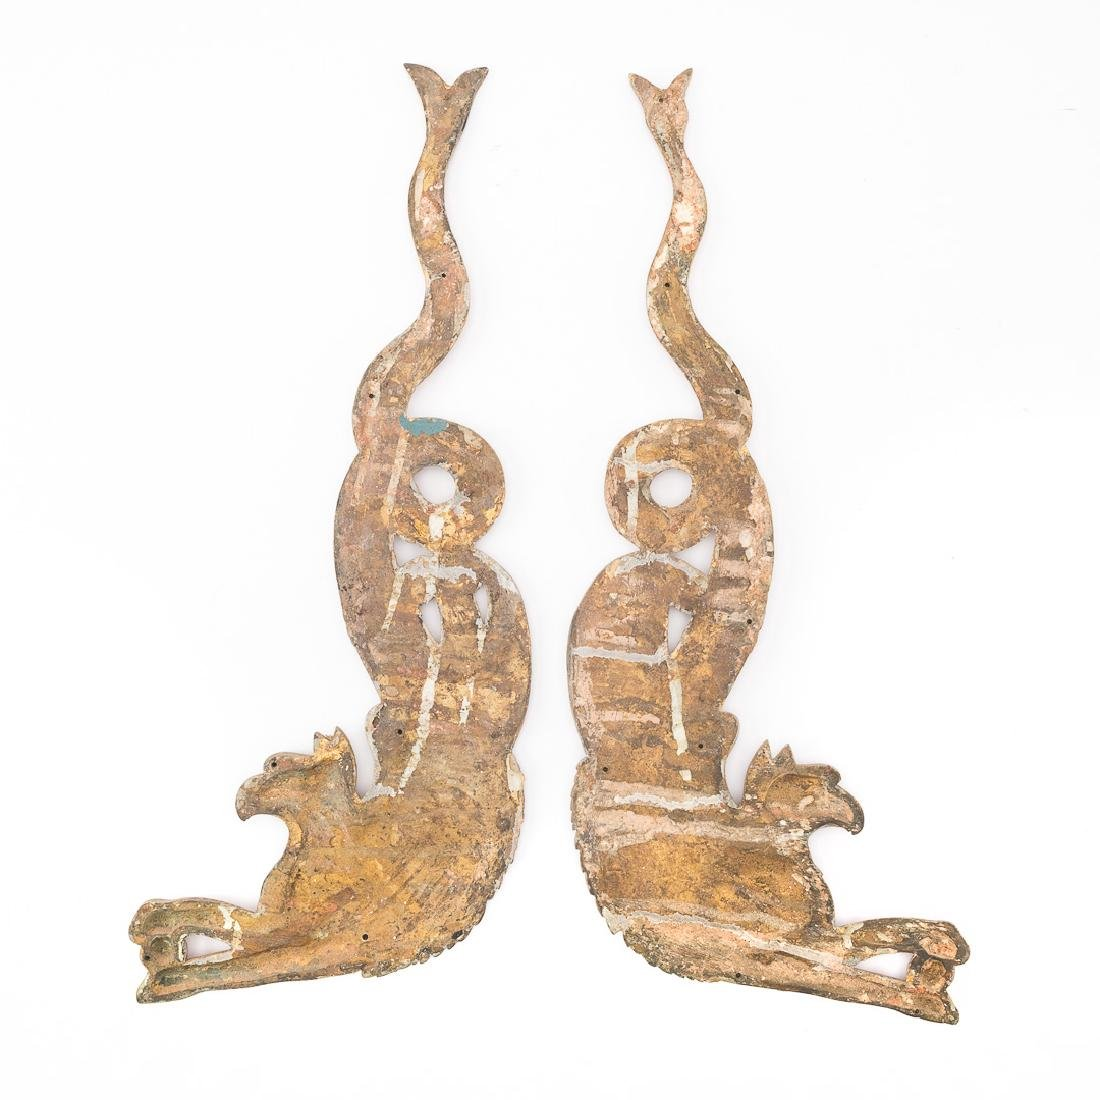 Four French Empire bronze dore mounts - 4